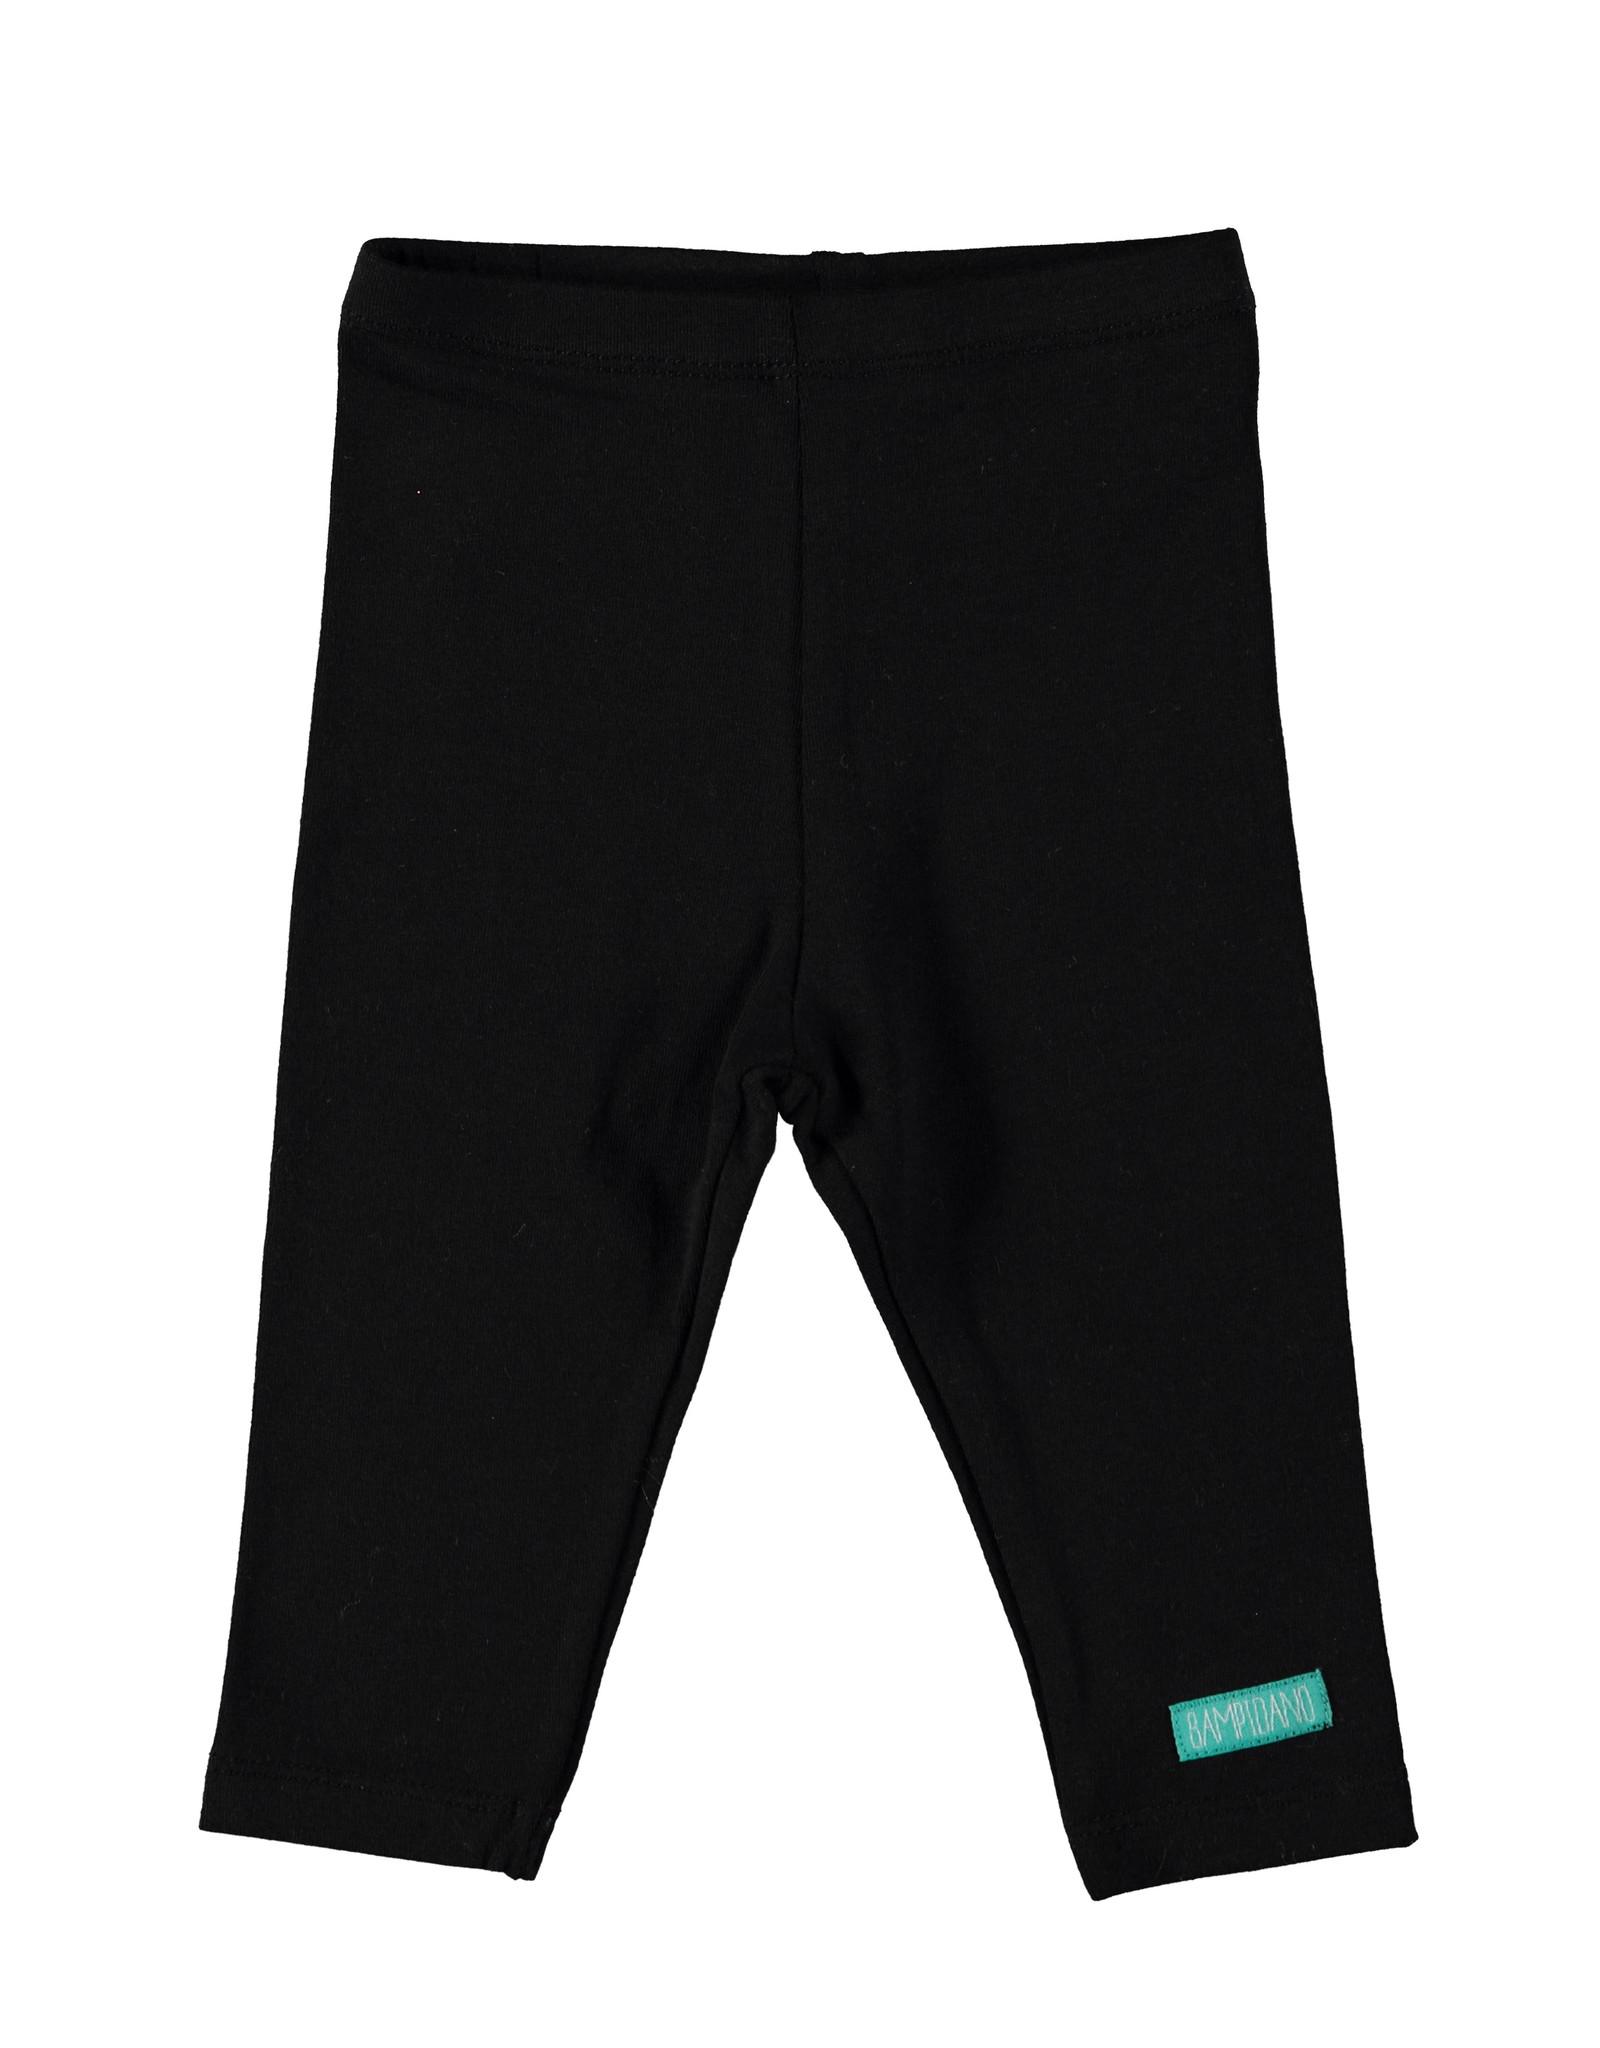 Bampidano New Born legging plain, black